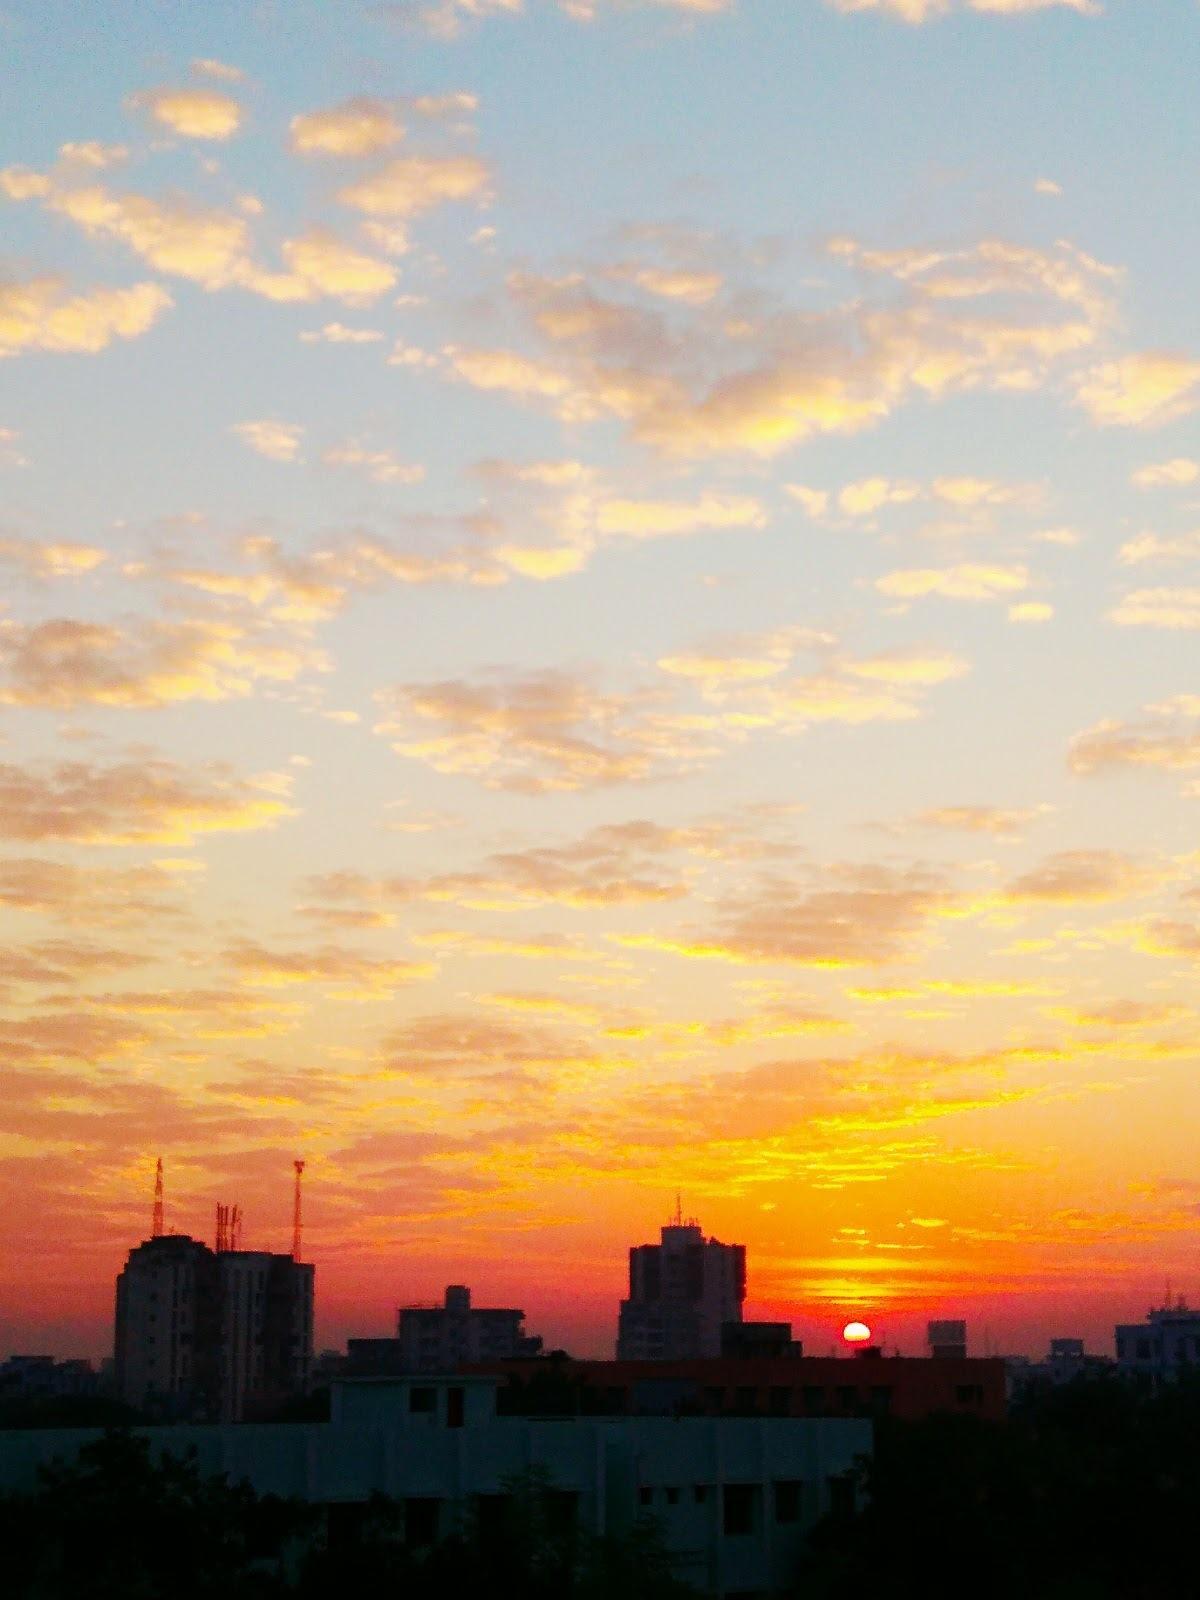 morning view  by Shaket Kumar